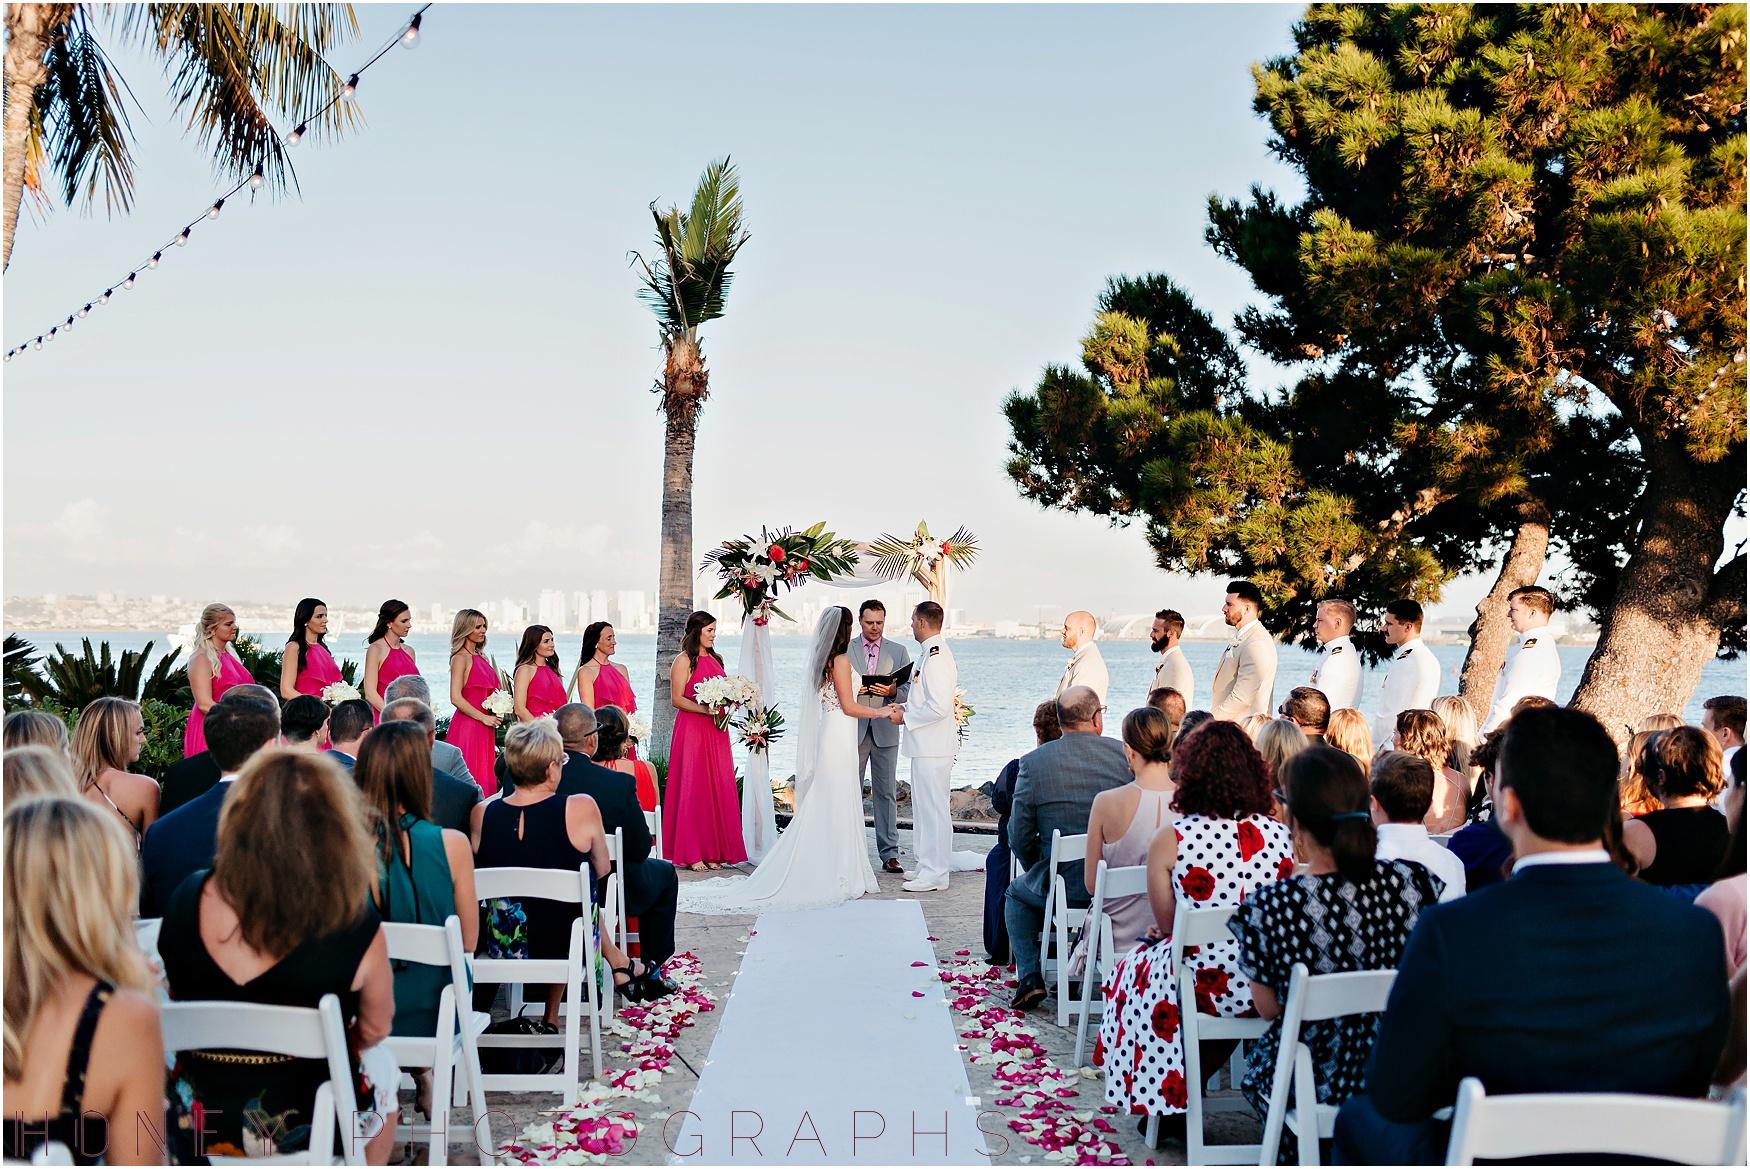 bali-hai-tropical-bubble-exit-party-paradise-wedding022.jpg